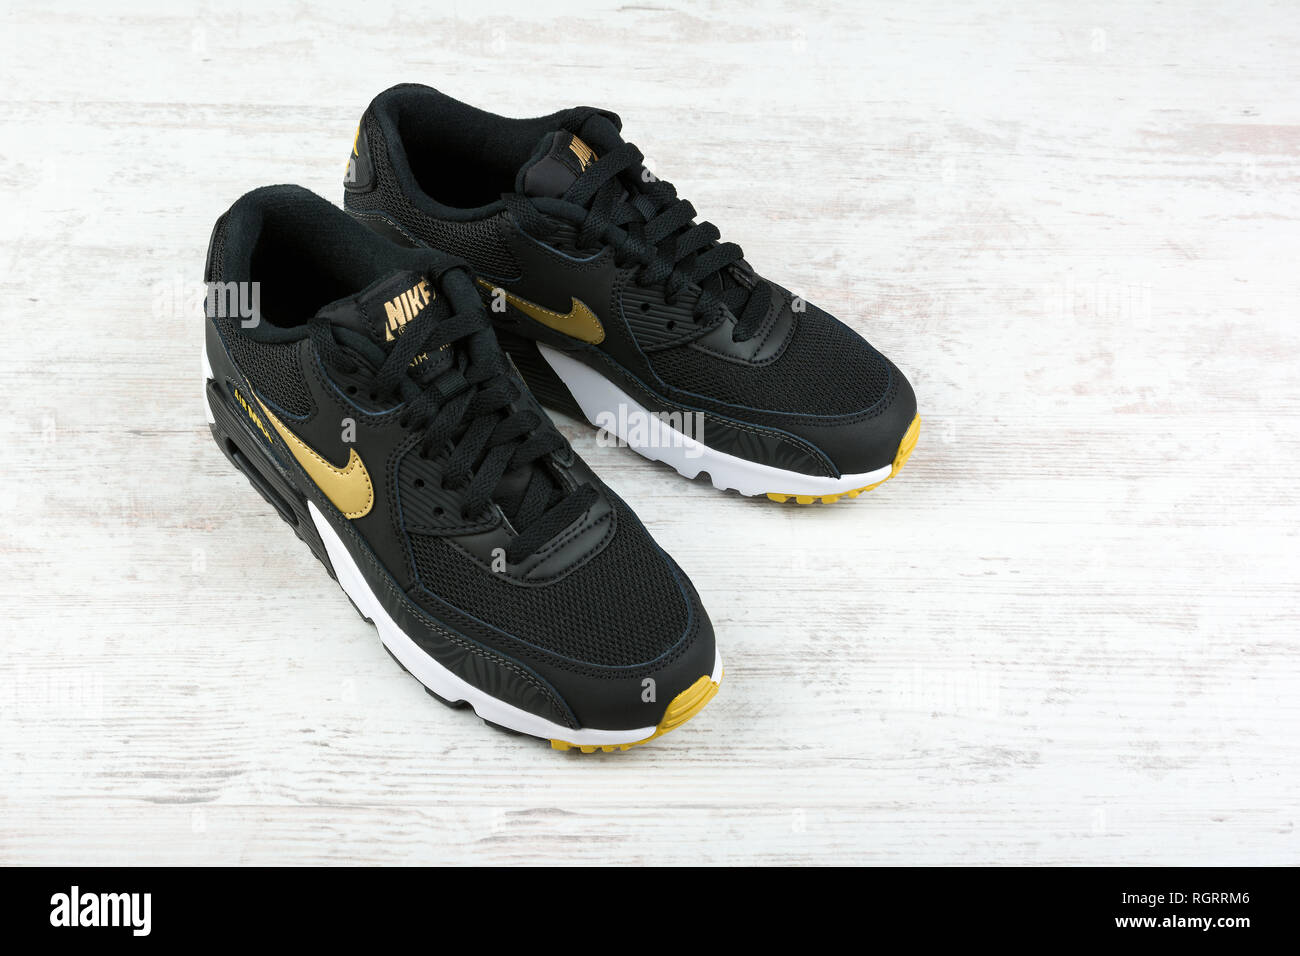 pretty nice 854ef d9f5d BURGAS, BULGARIA - DECEMBER 29, 2016  Nike Air MAX women s shoes - sneakers